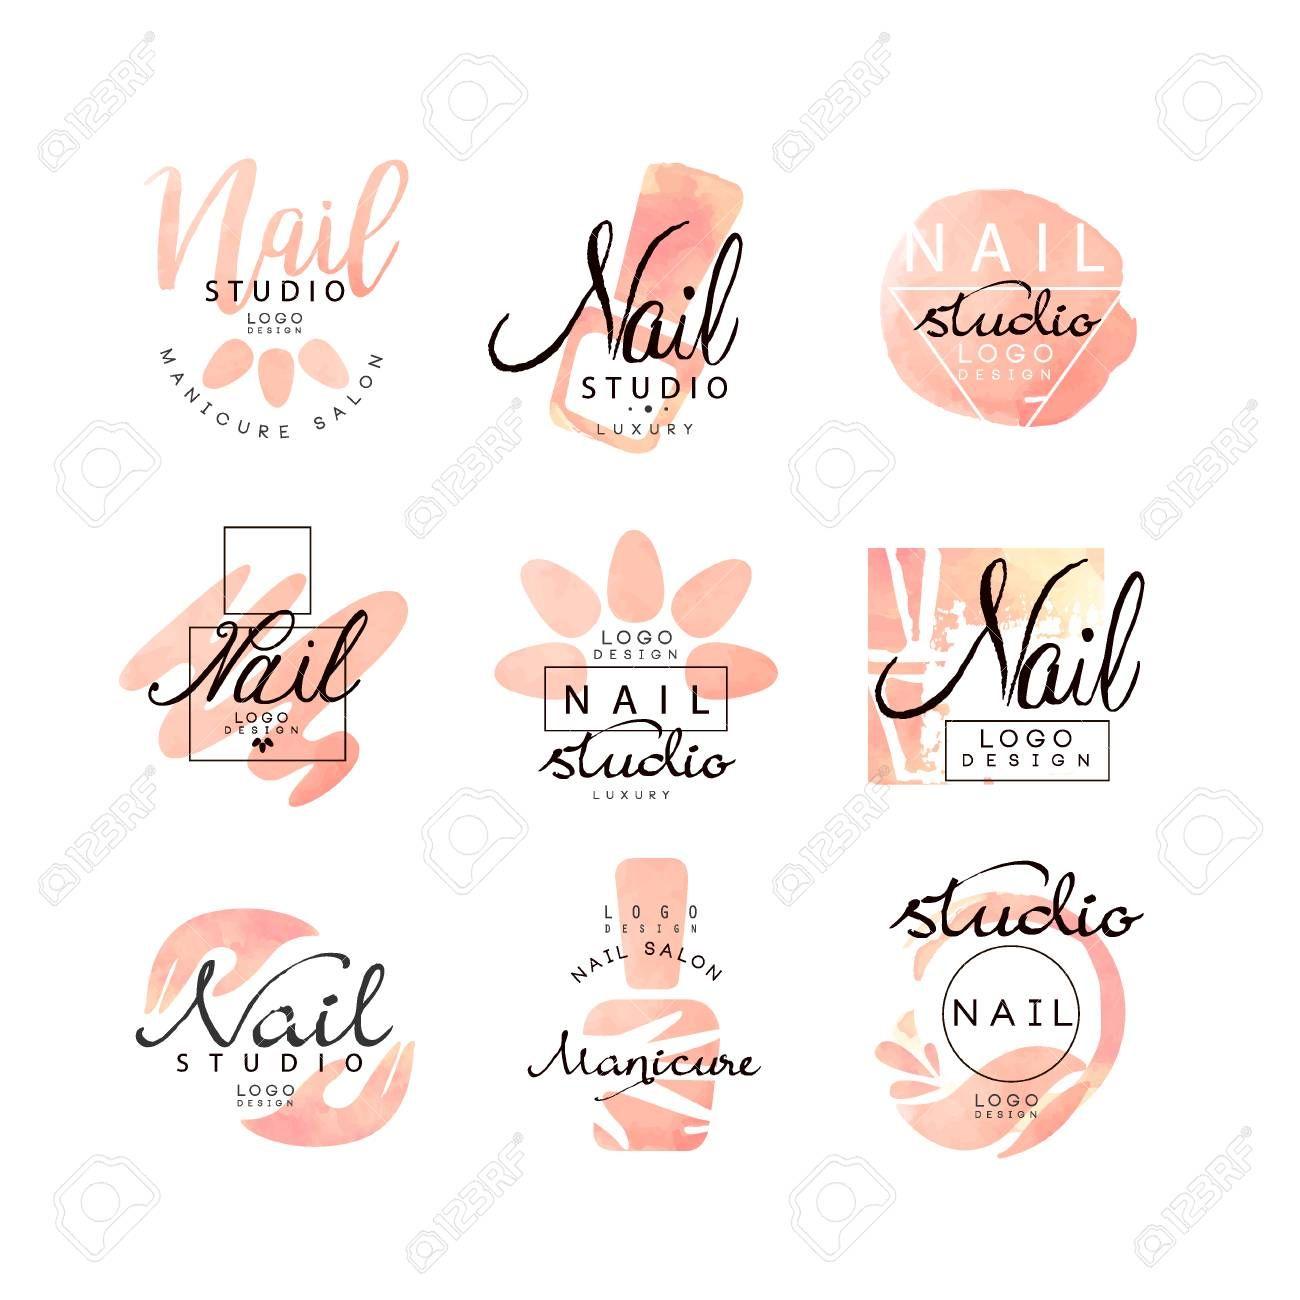 Manicure nail studio design set, creative templates for